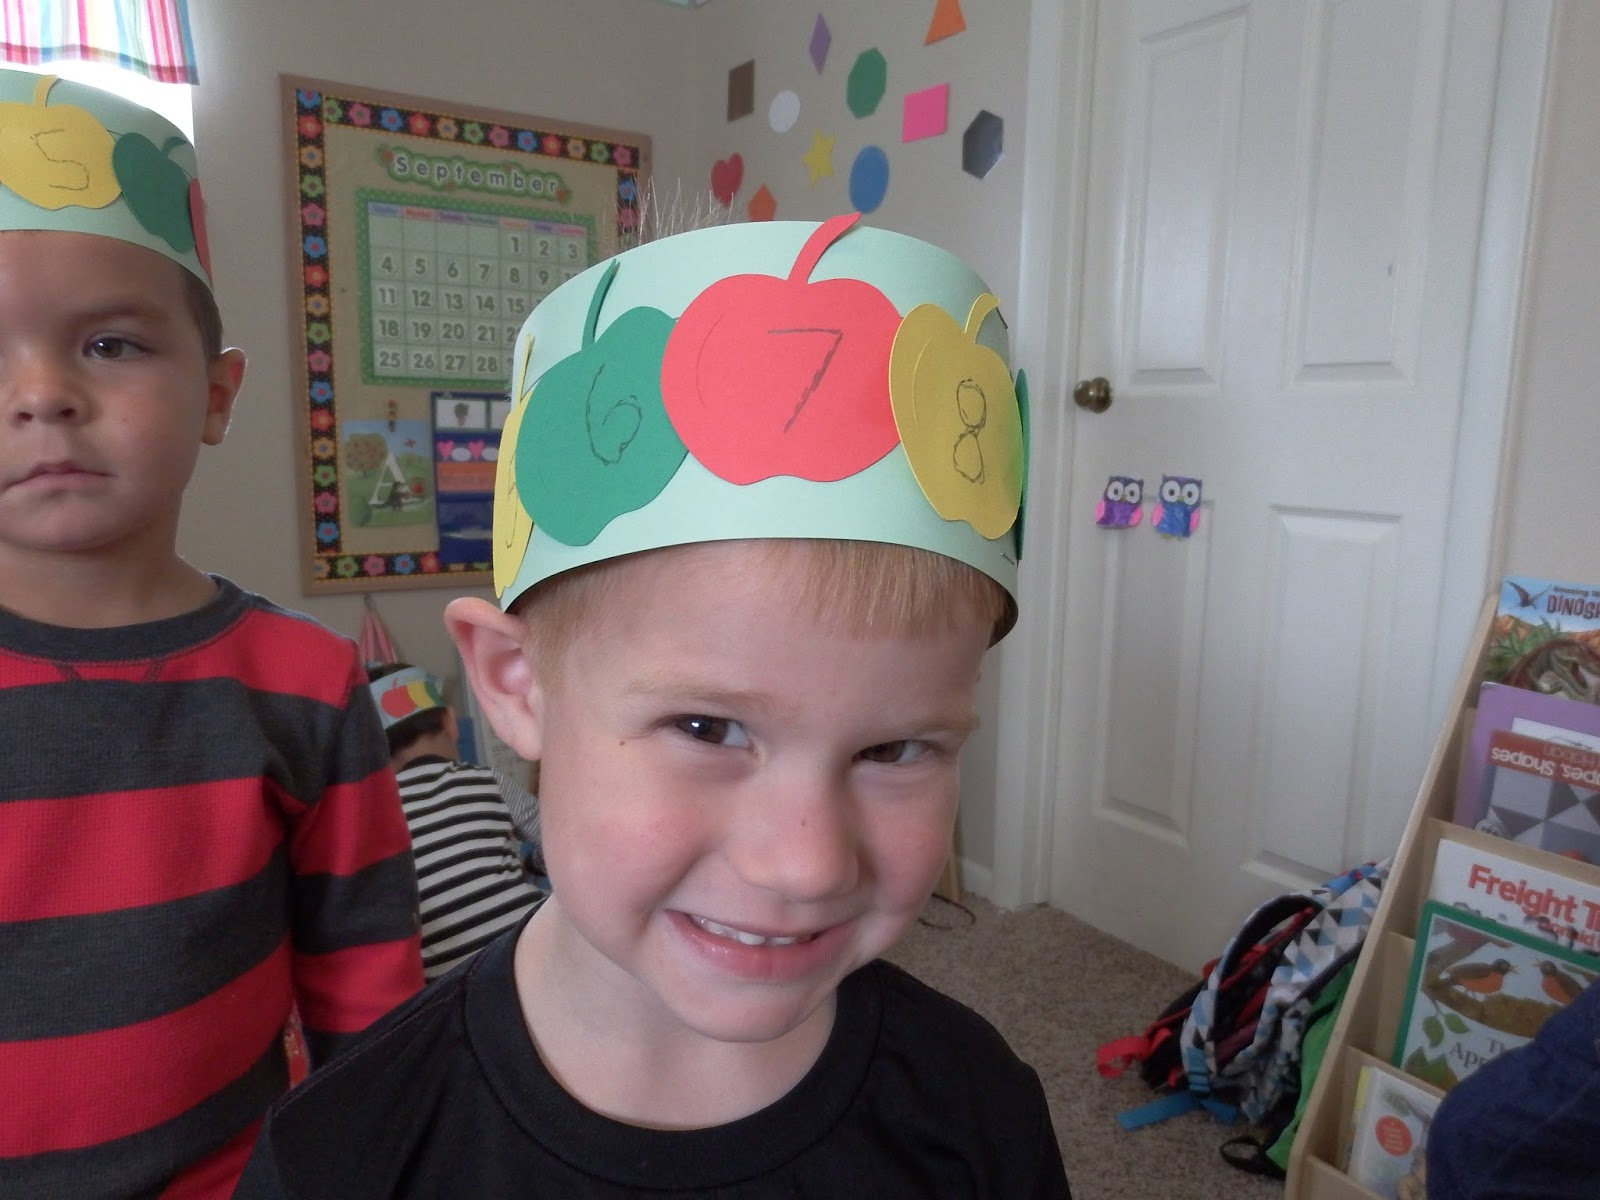 Chipman's Corner Preschool: A Is For Apple